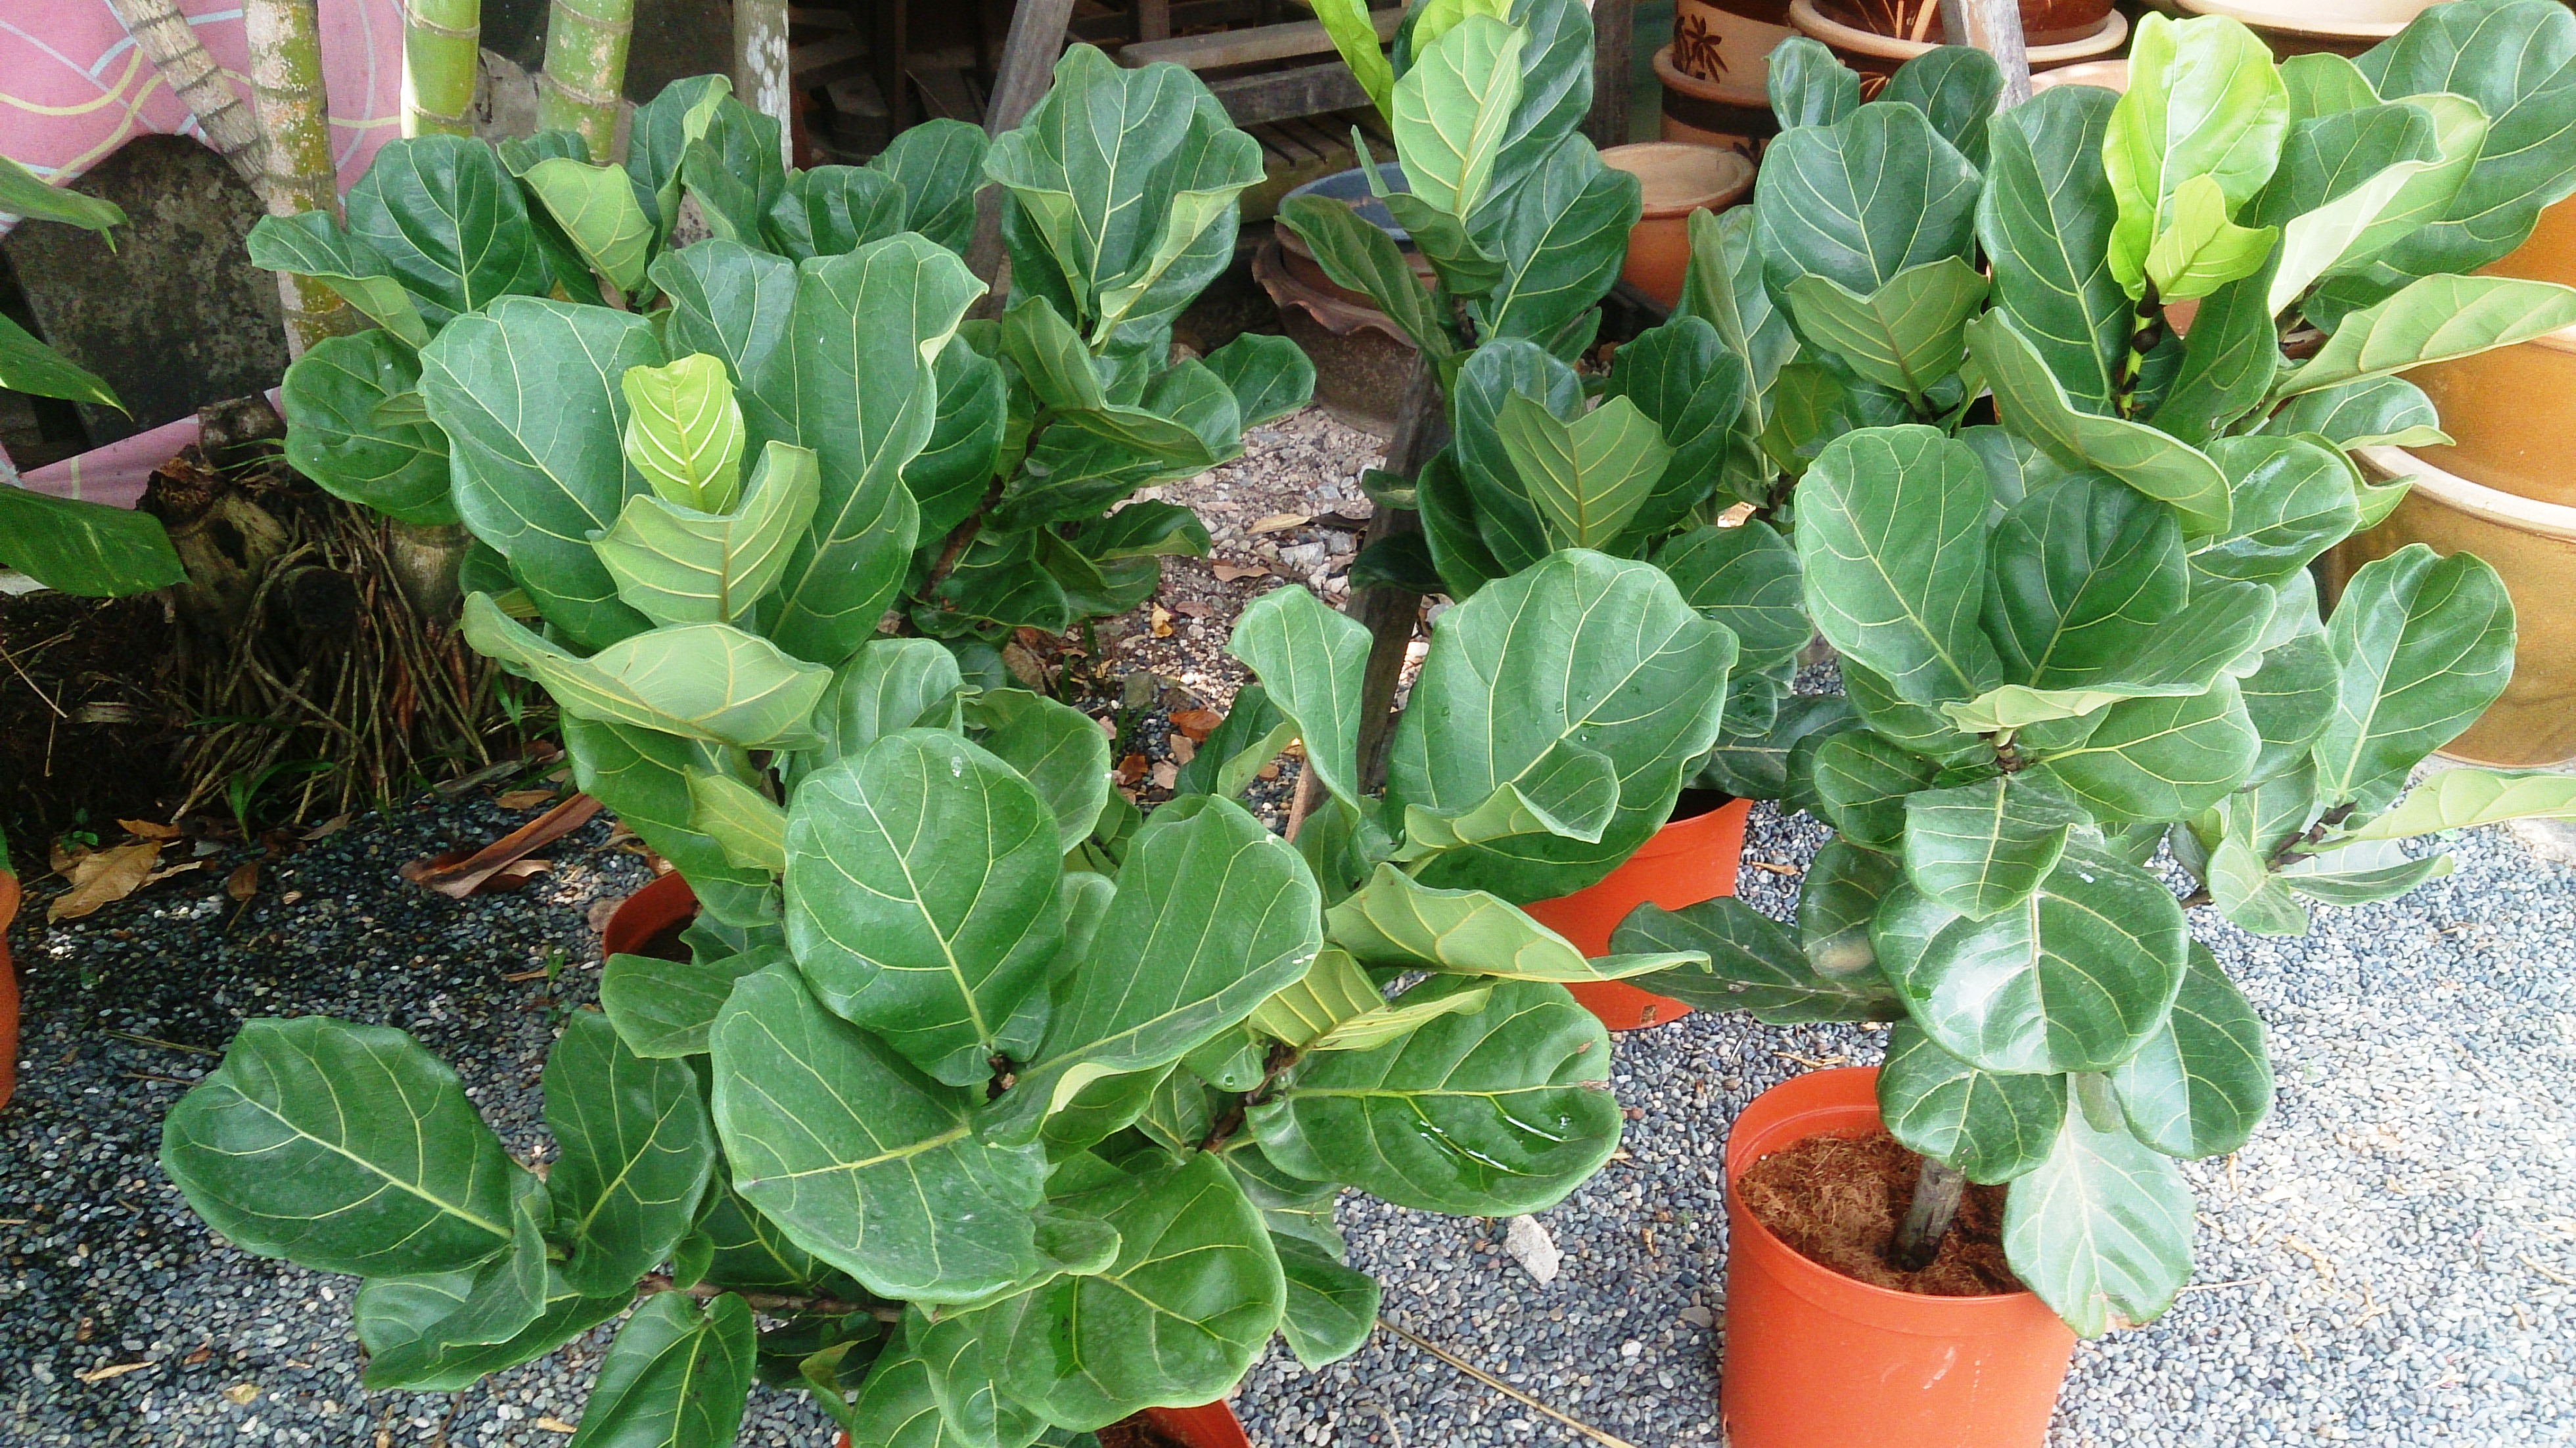 File:Fiddle leaf fig 5.jpg - Wikimedia Commons